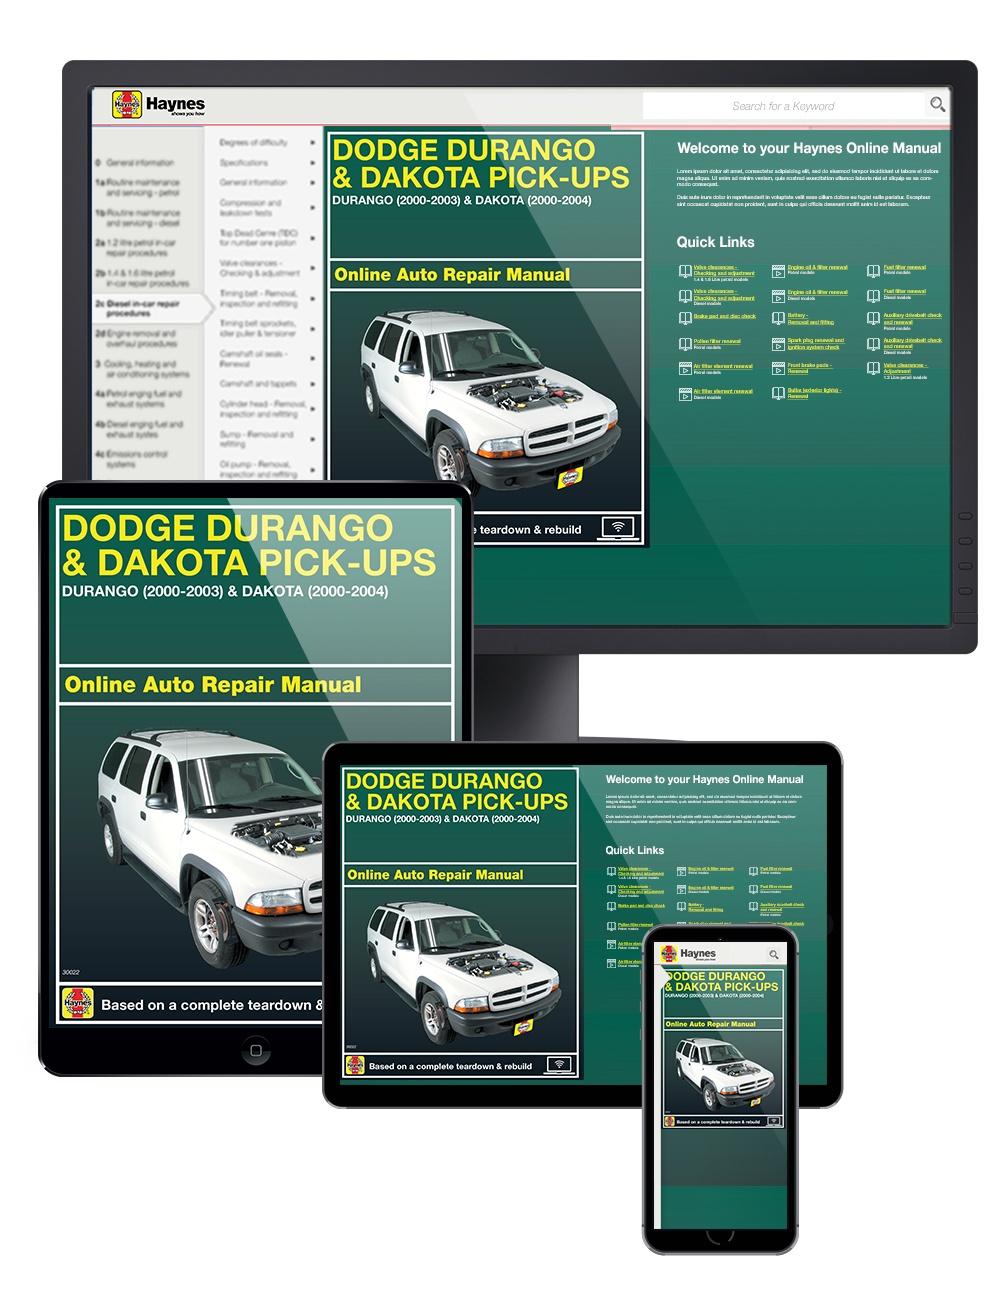 Manual cover for Dodge Durango (00-03) and Dodge Dakota (00-04) Haynes Online Manual